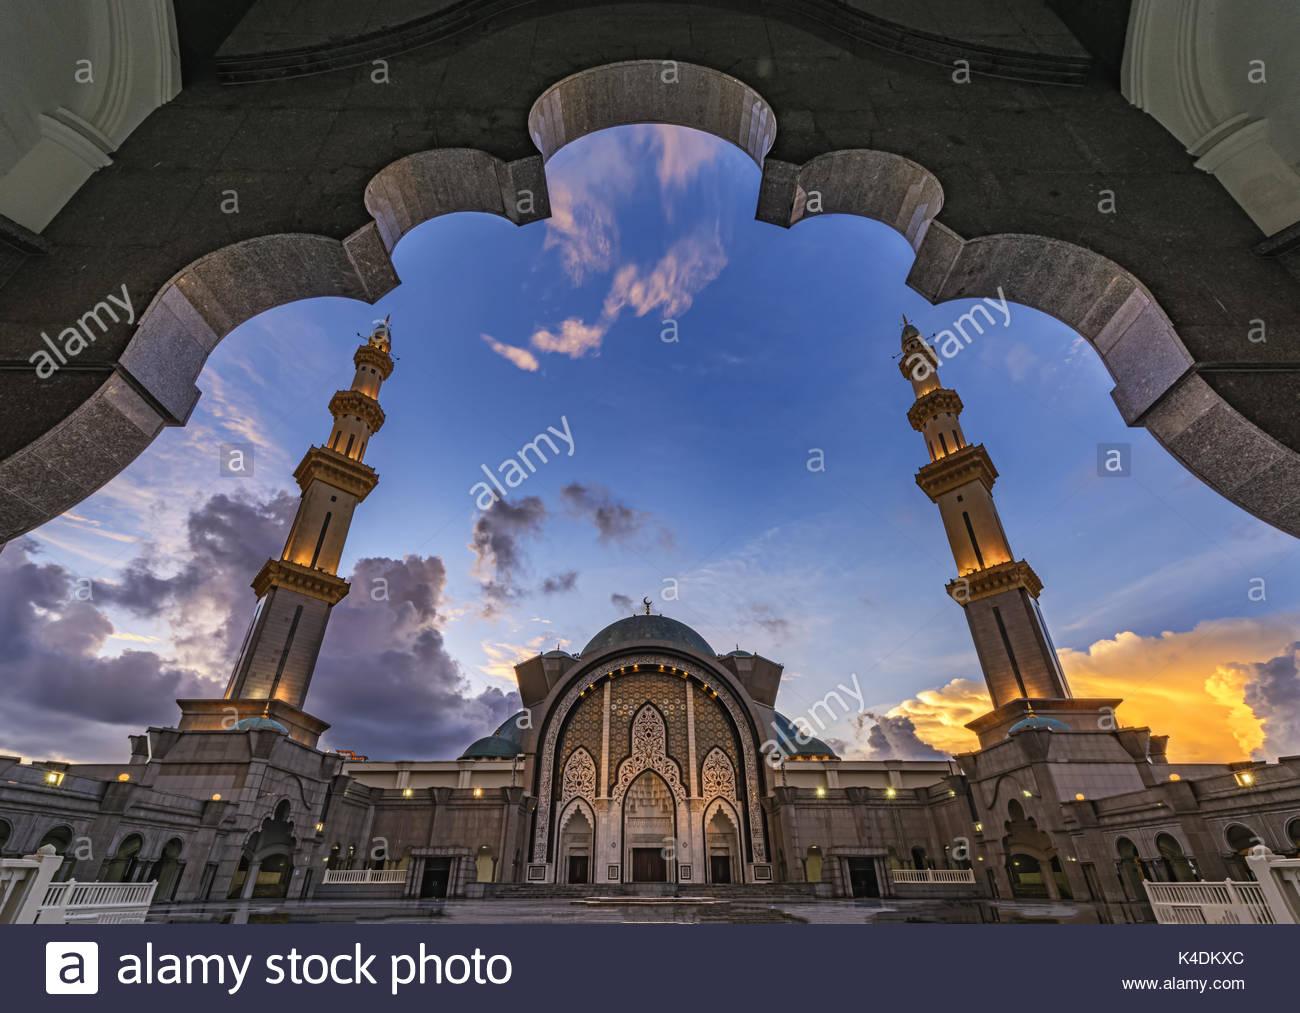 Federal territory mosque, Kuala Lumpur - Stock Image